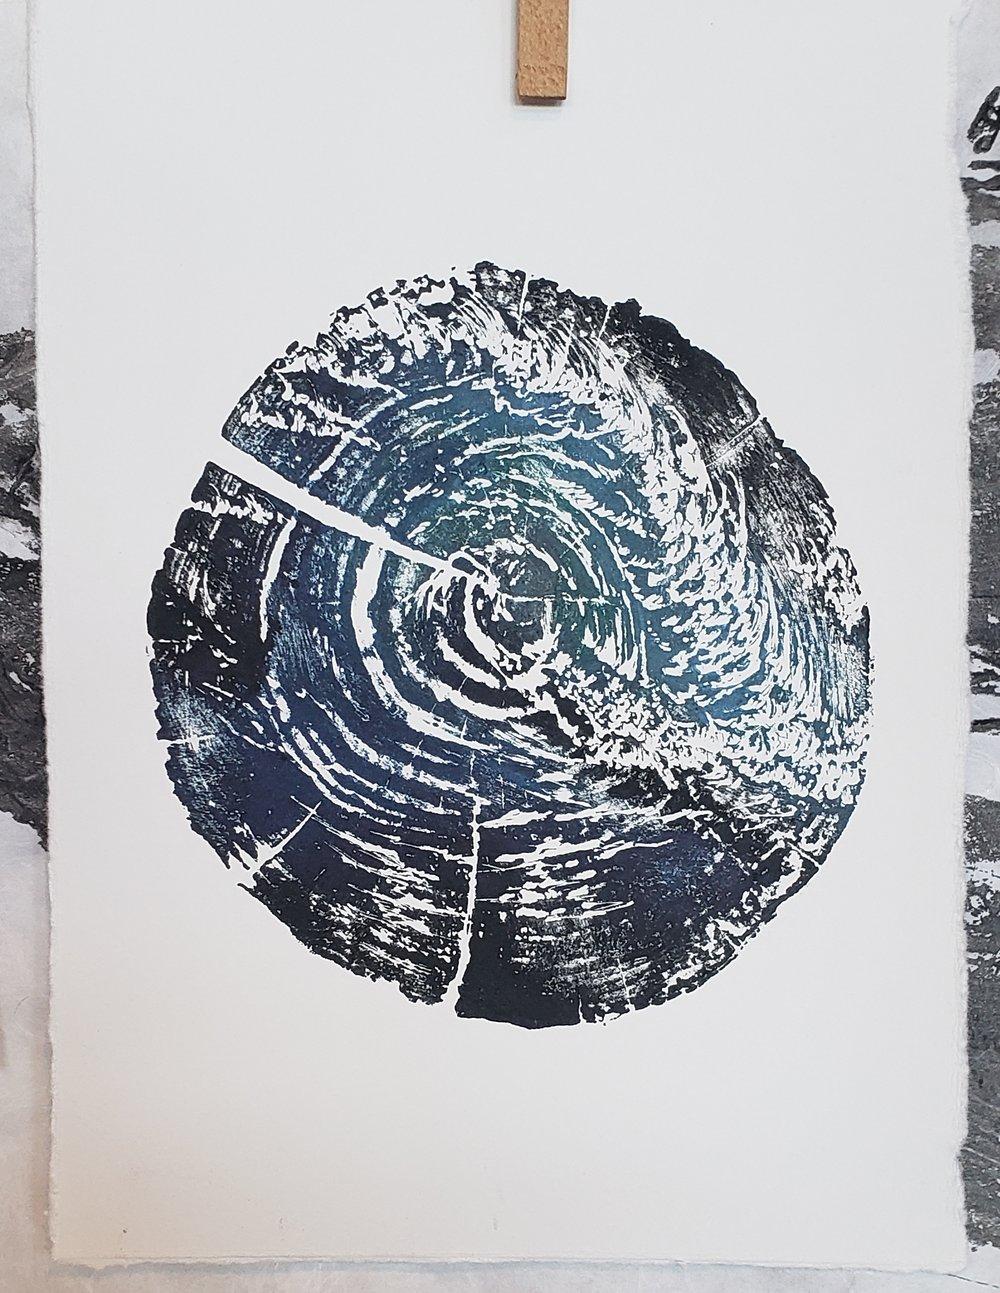 'Wave in the Wood' Woodblock print by Karen Britt